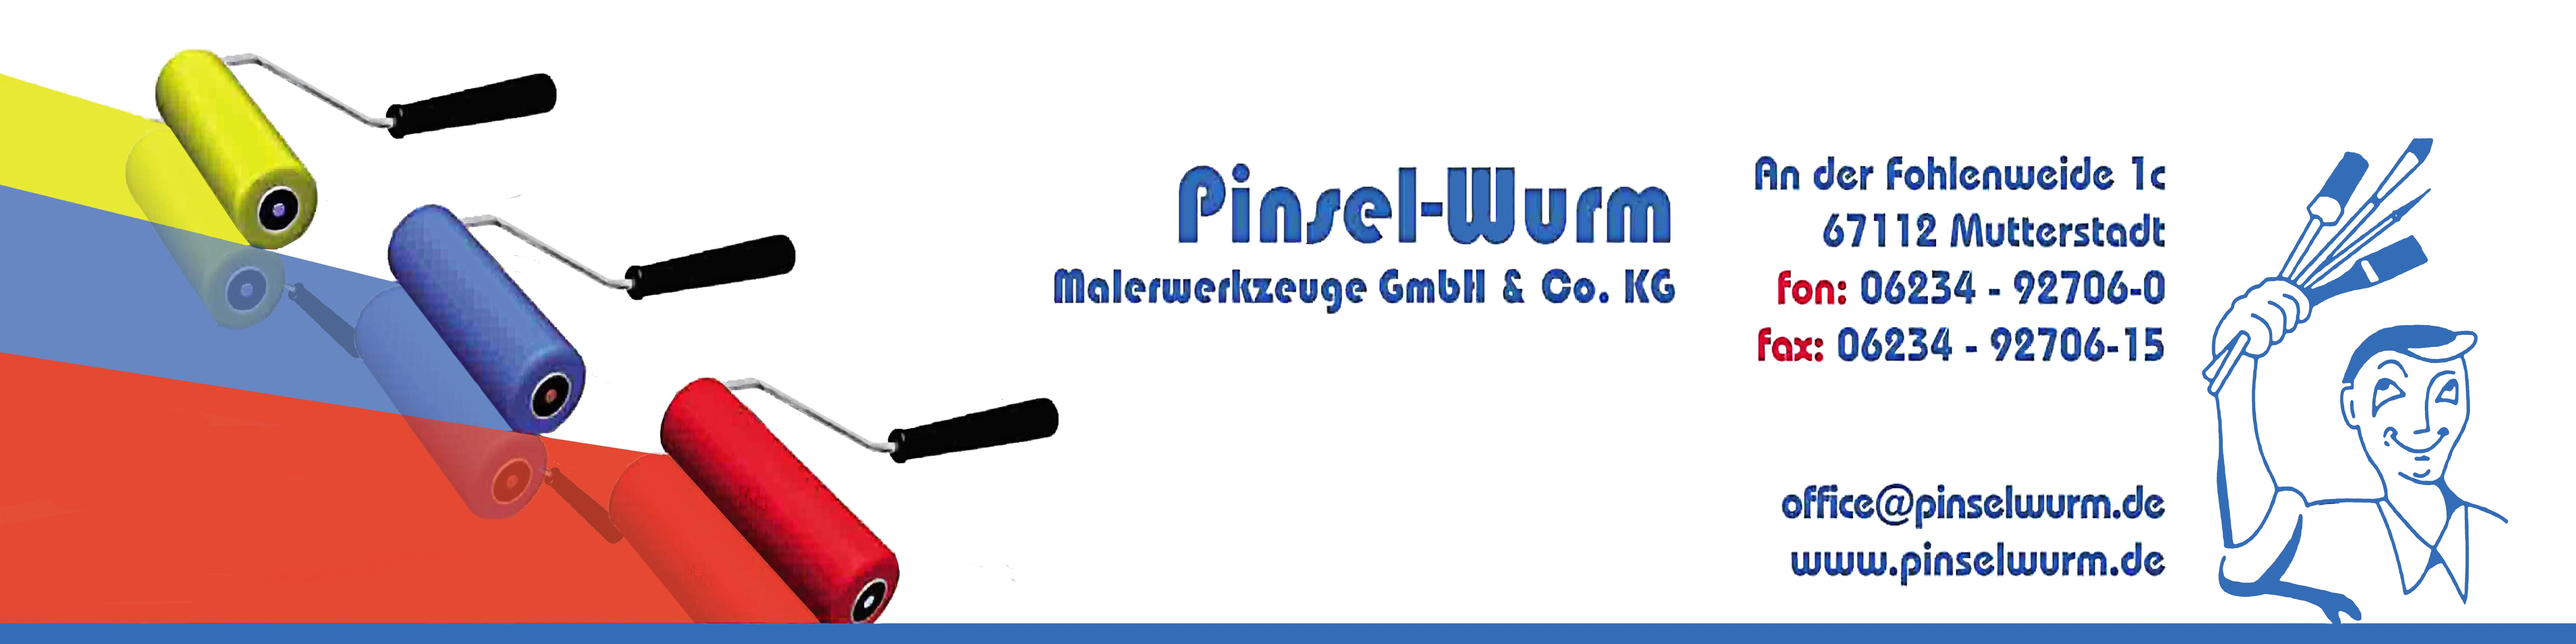 Pinselwurm